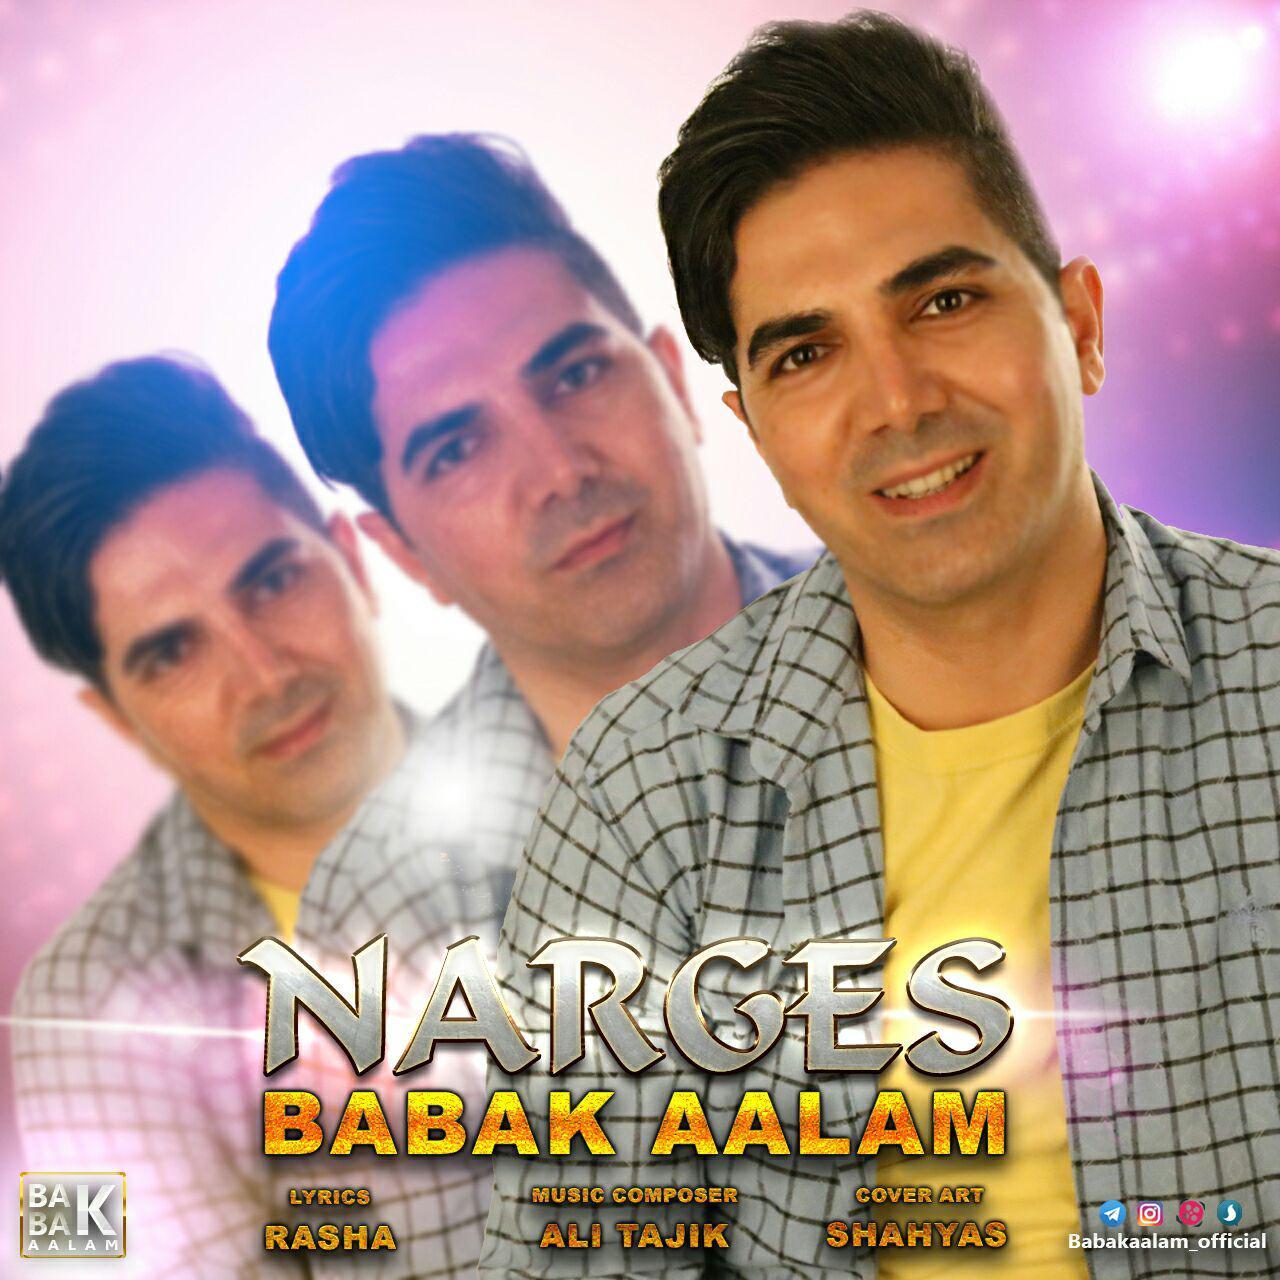 Babak Aalam – Narges